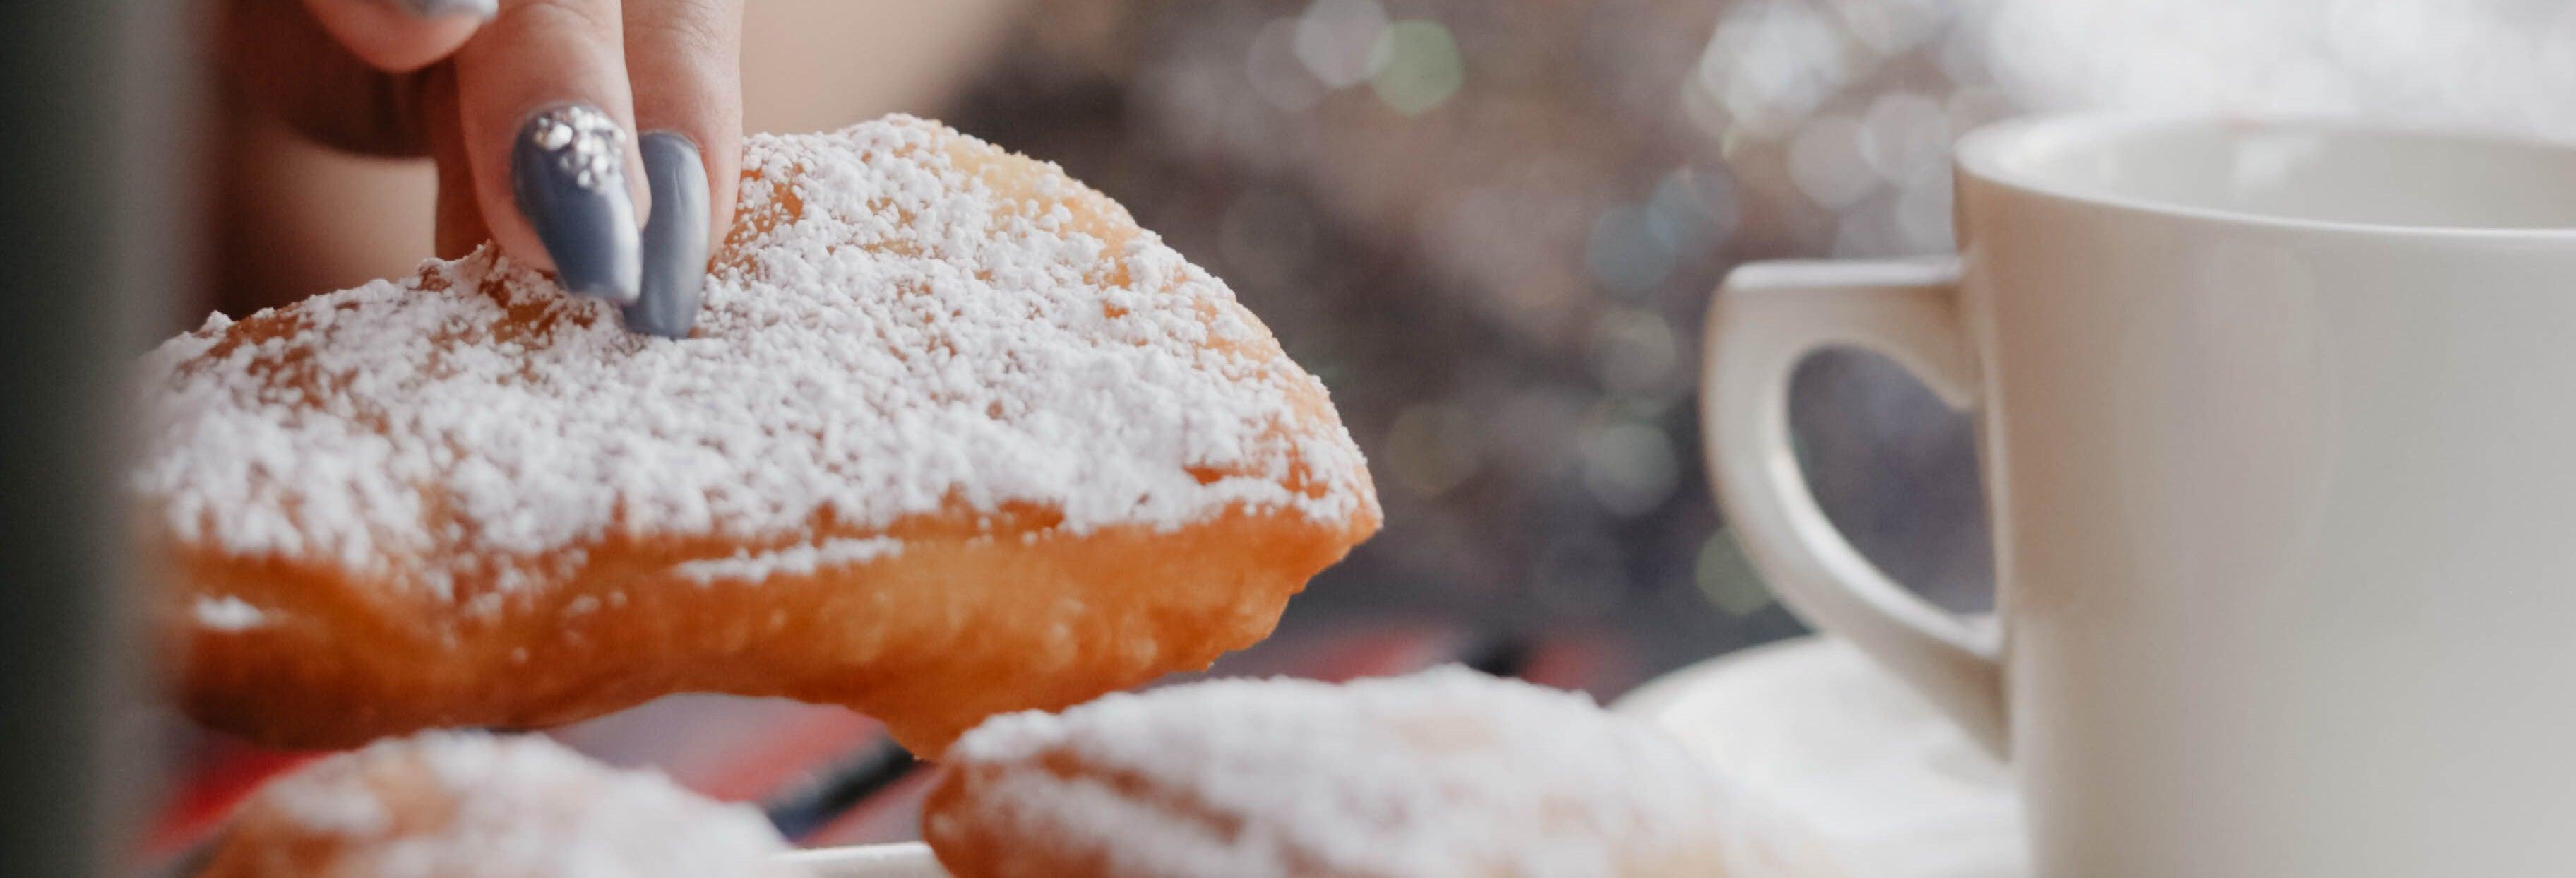 Tour gastronômico por New Orleans